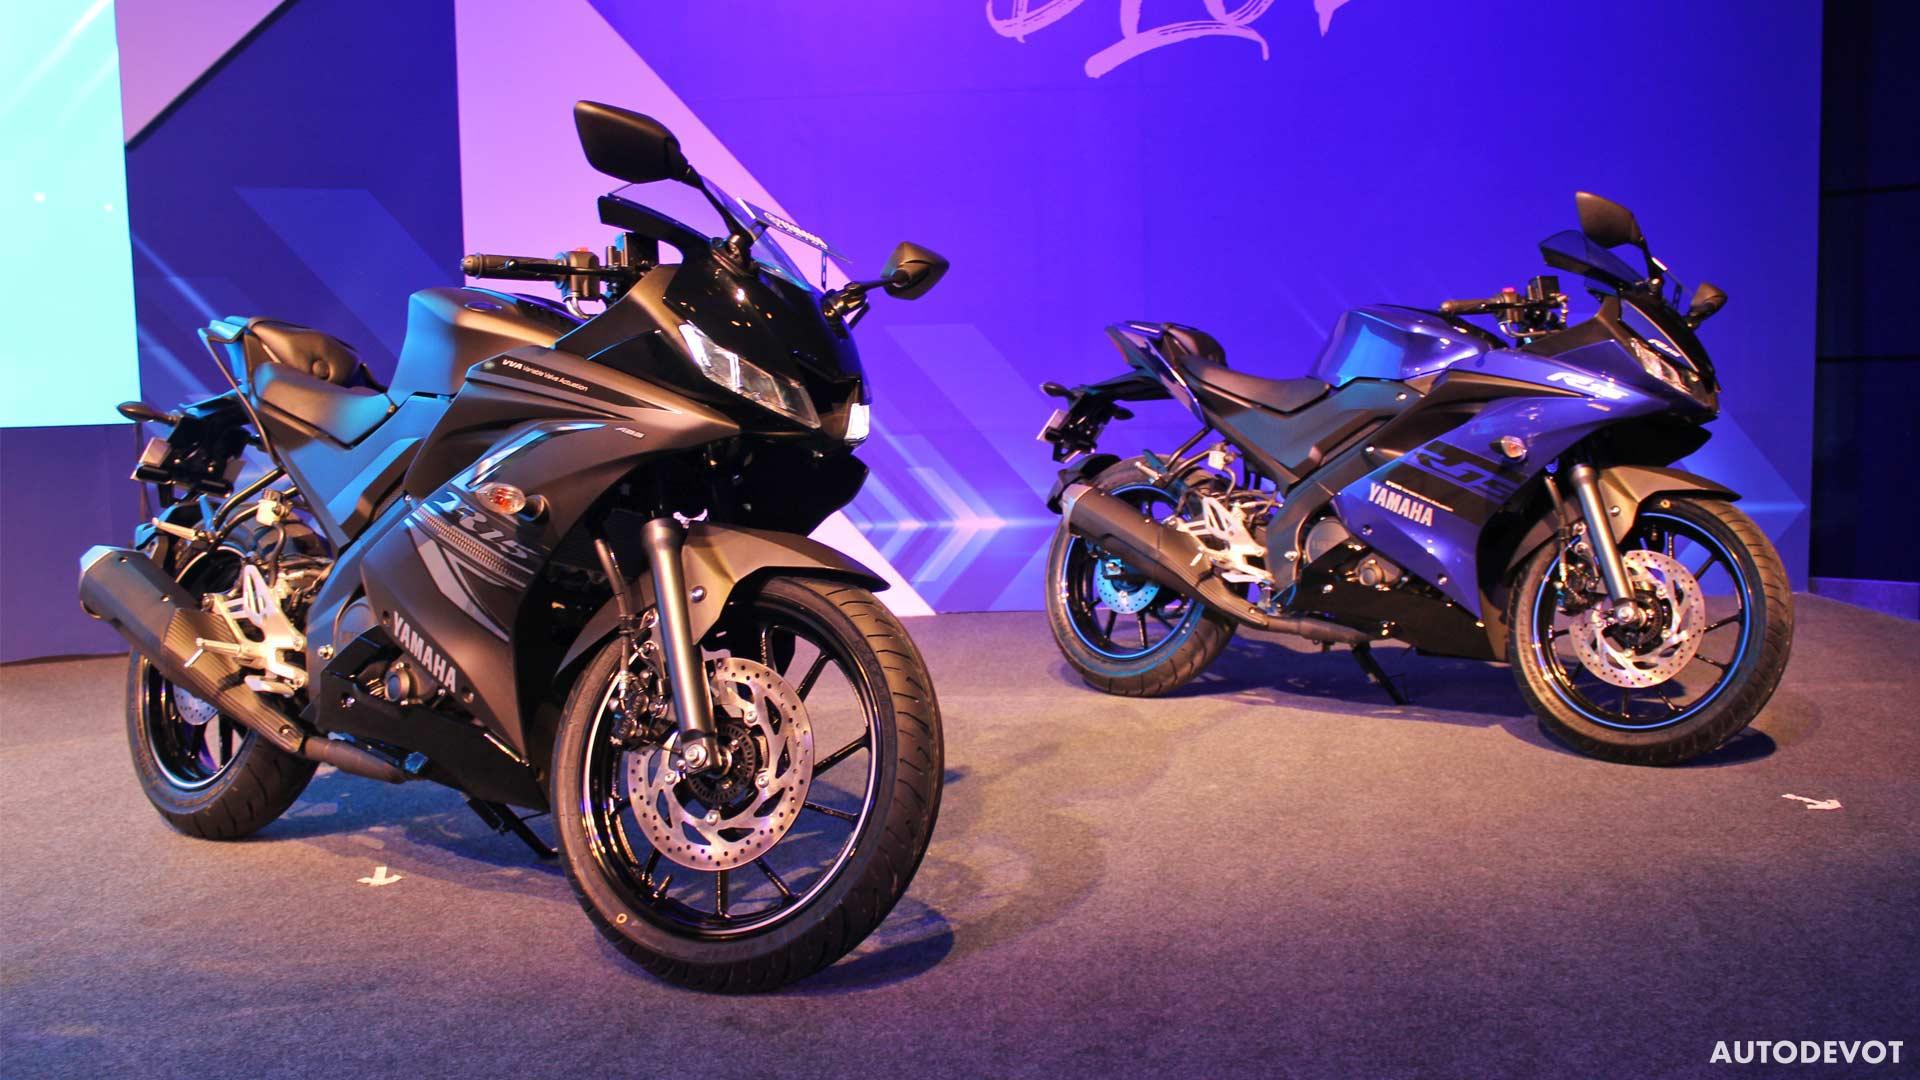 Yamaha-R15-Version-3.0-showcase-2019-Bengaluru